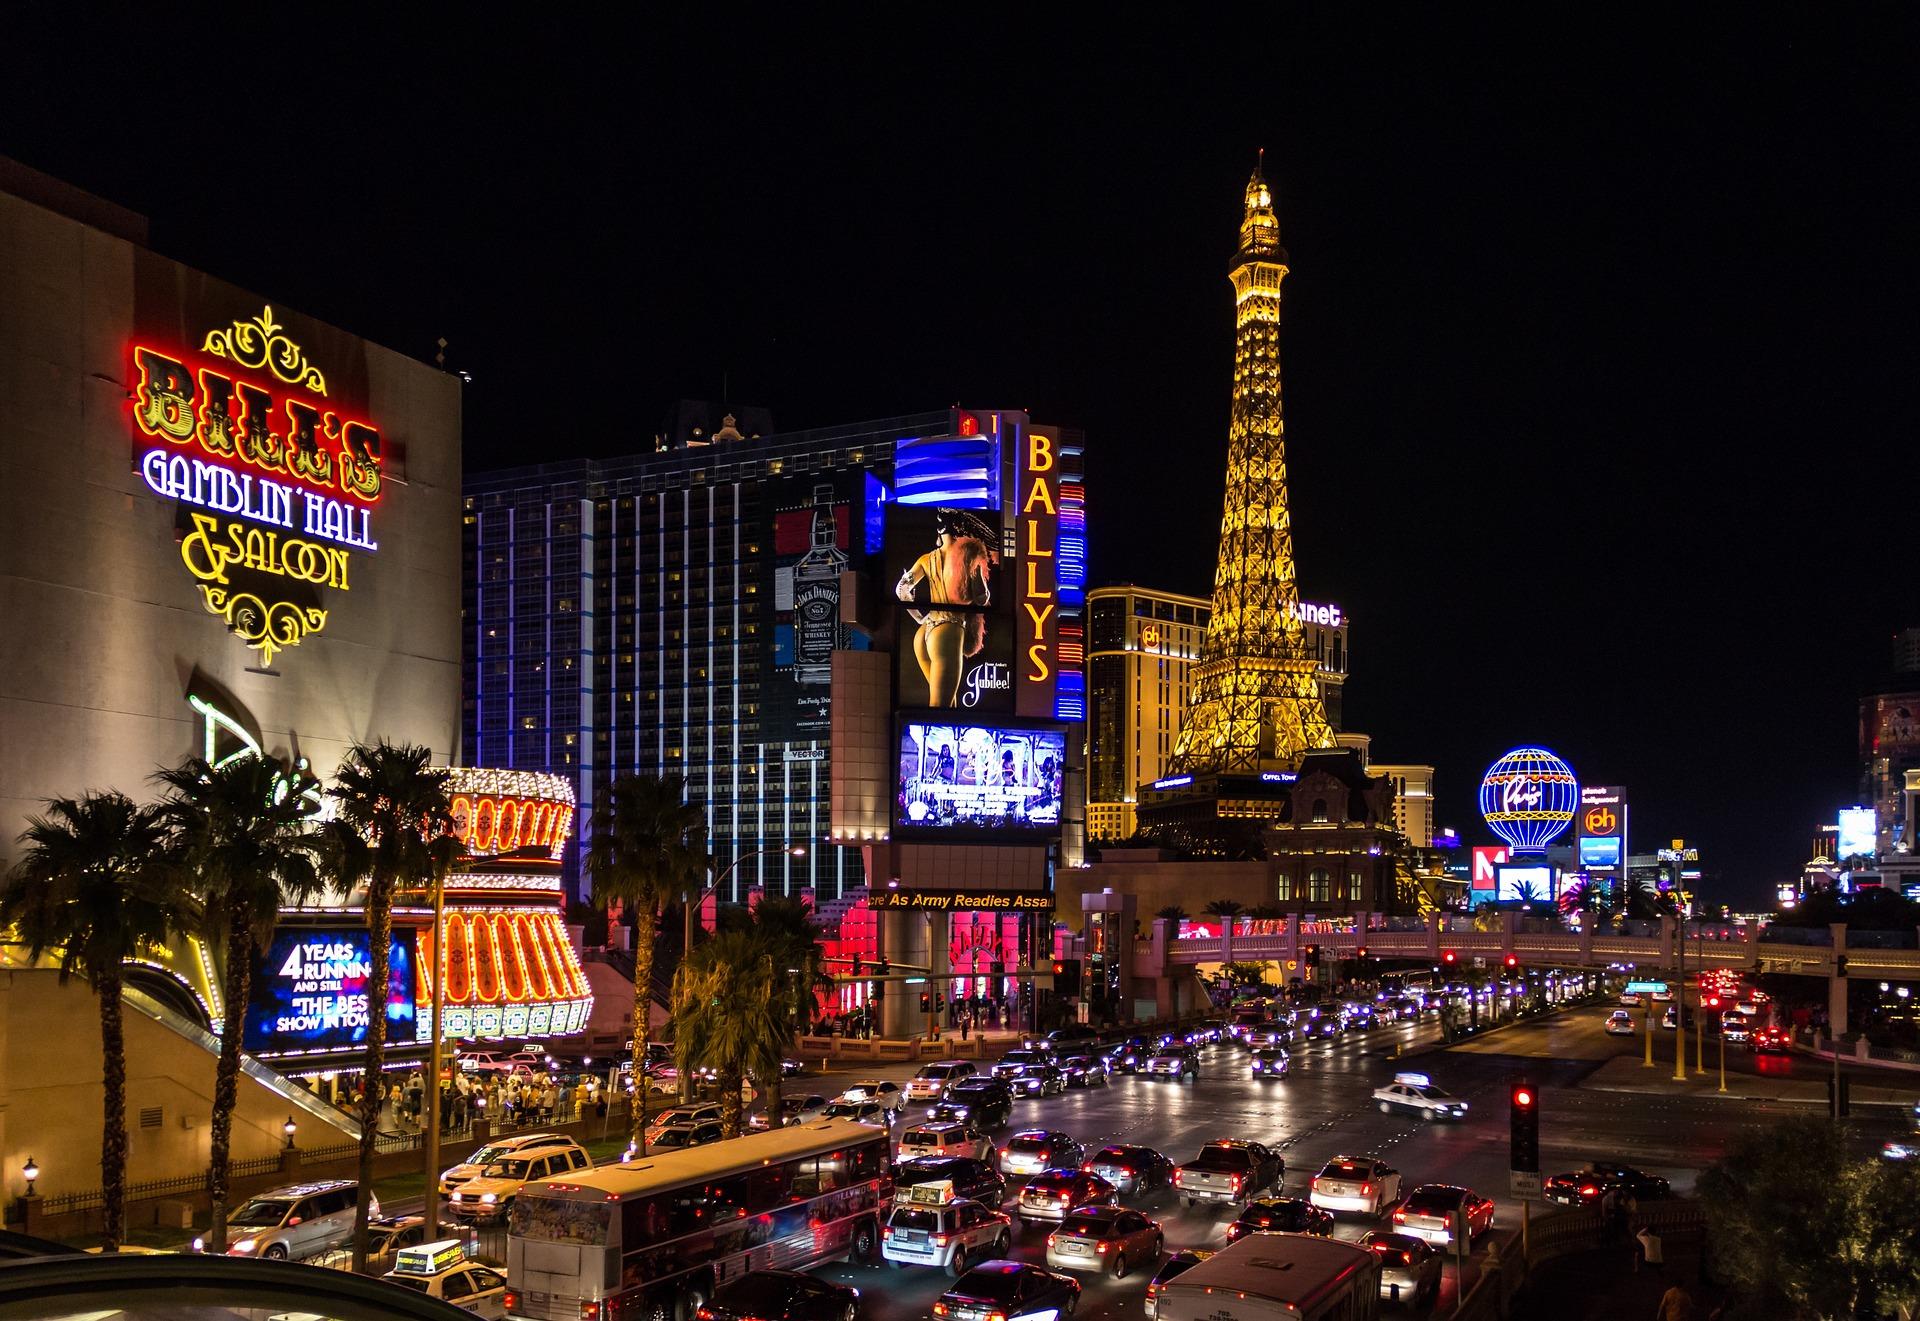 Las vegas casino wiki leroy merlin quincaillerie roulettes